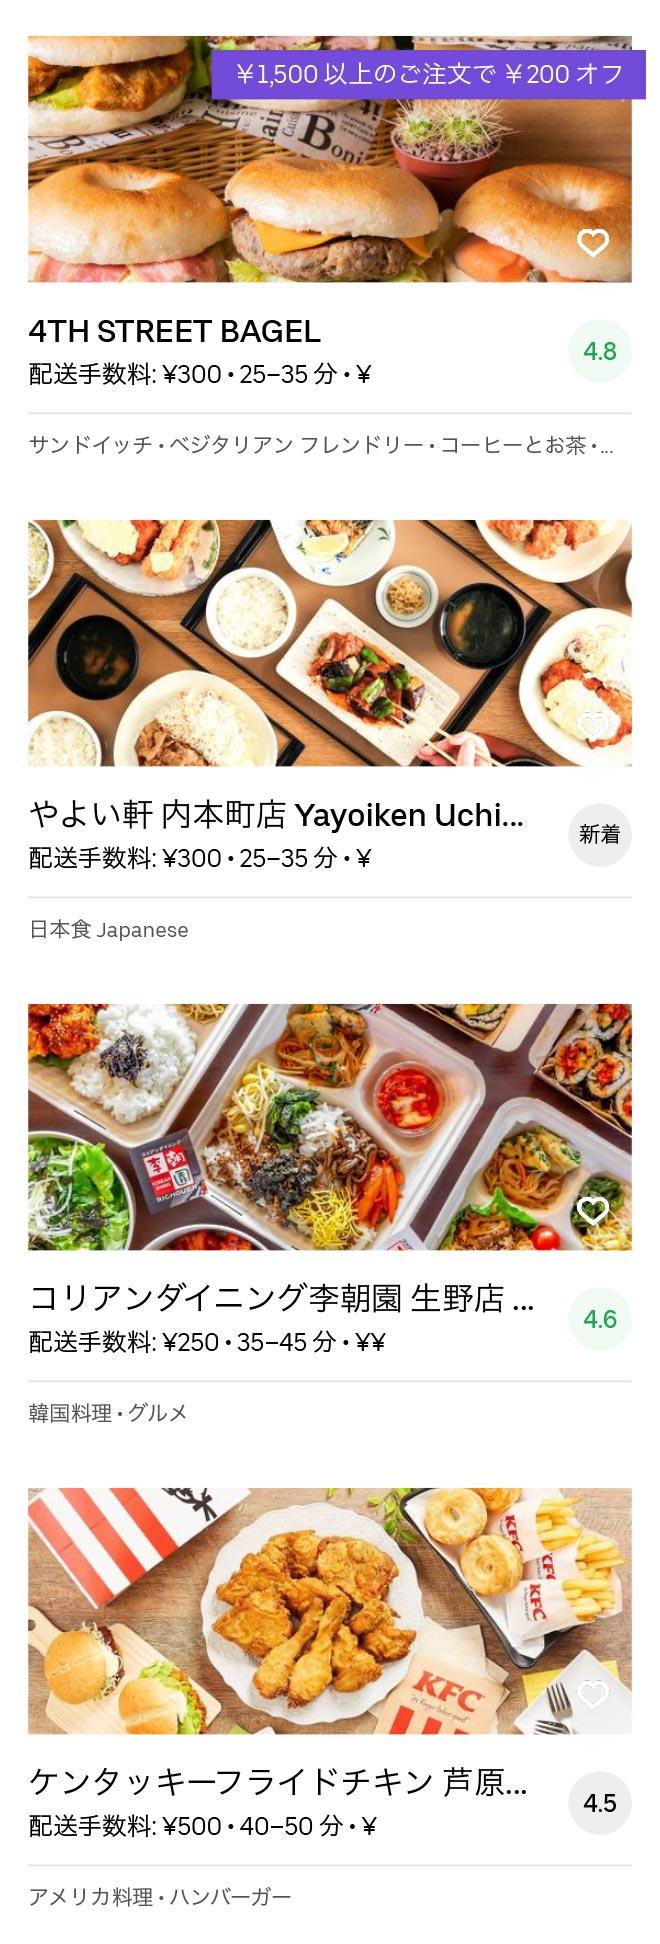 Osaka imazato menu 2005 02